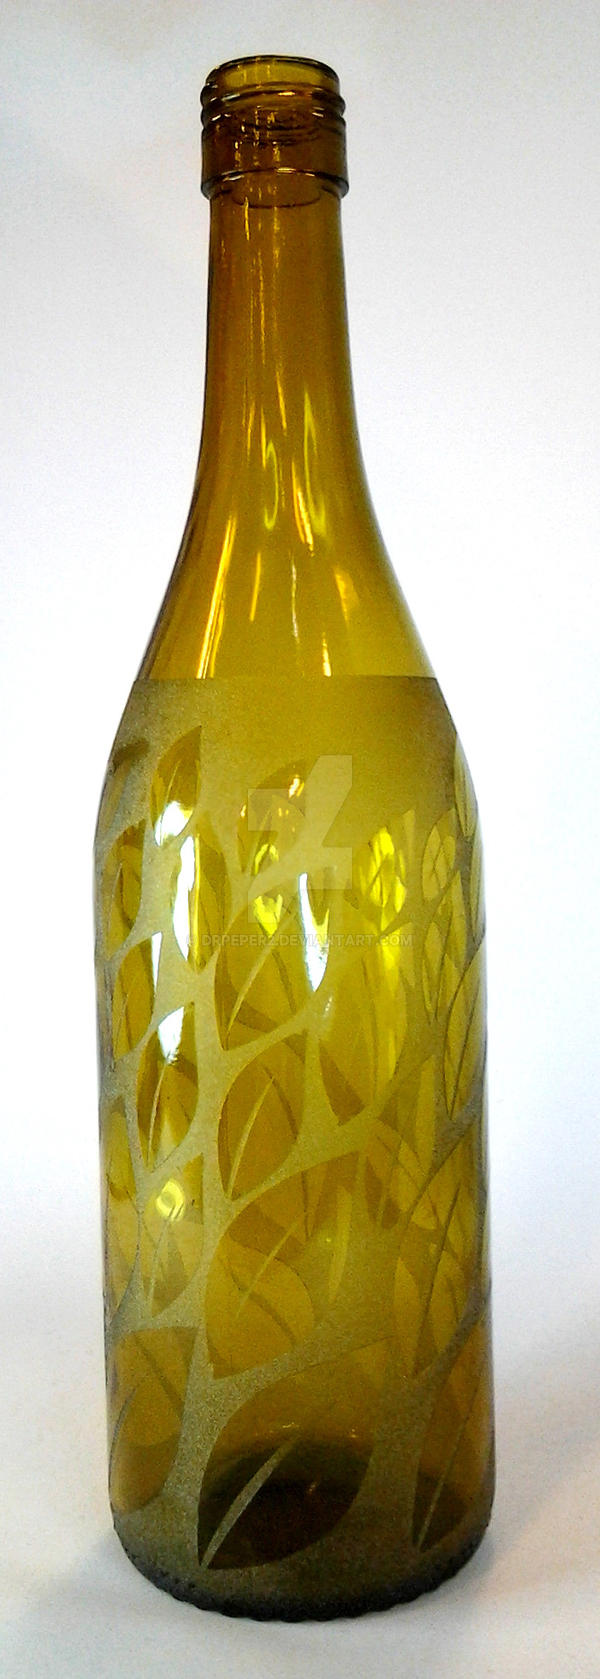 Leaf Bottle 1 by DrPeper2